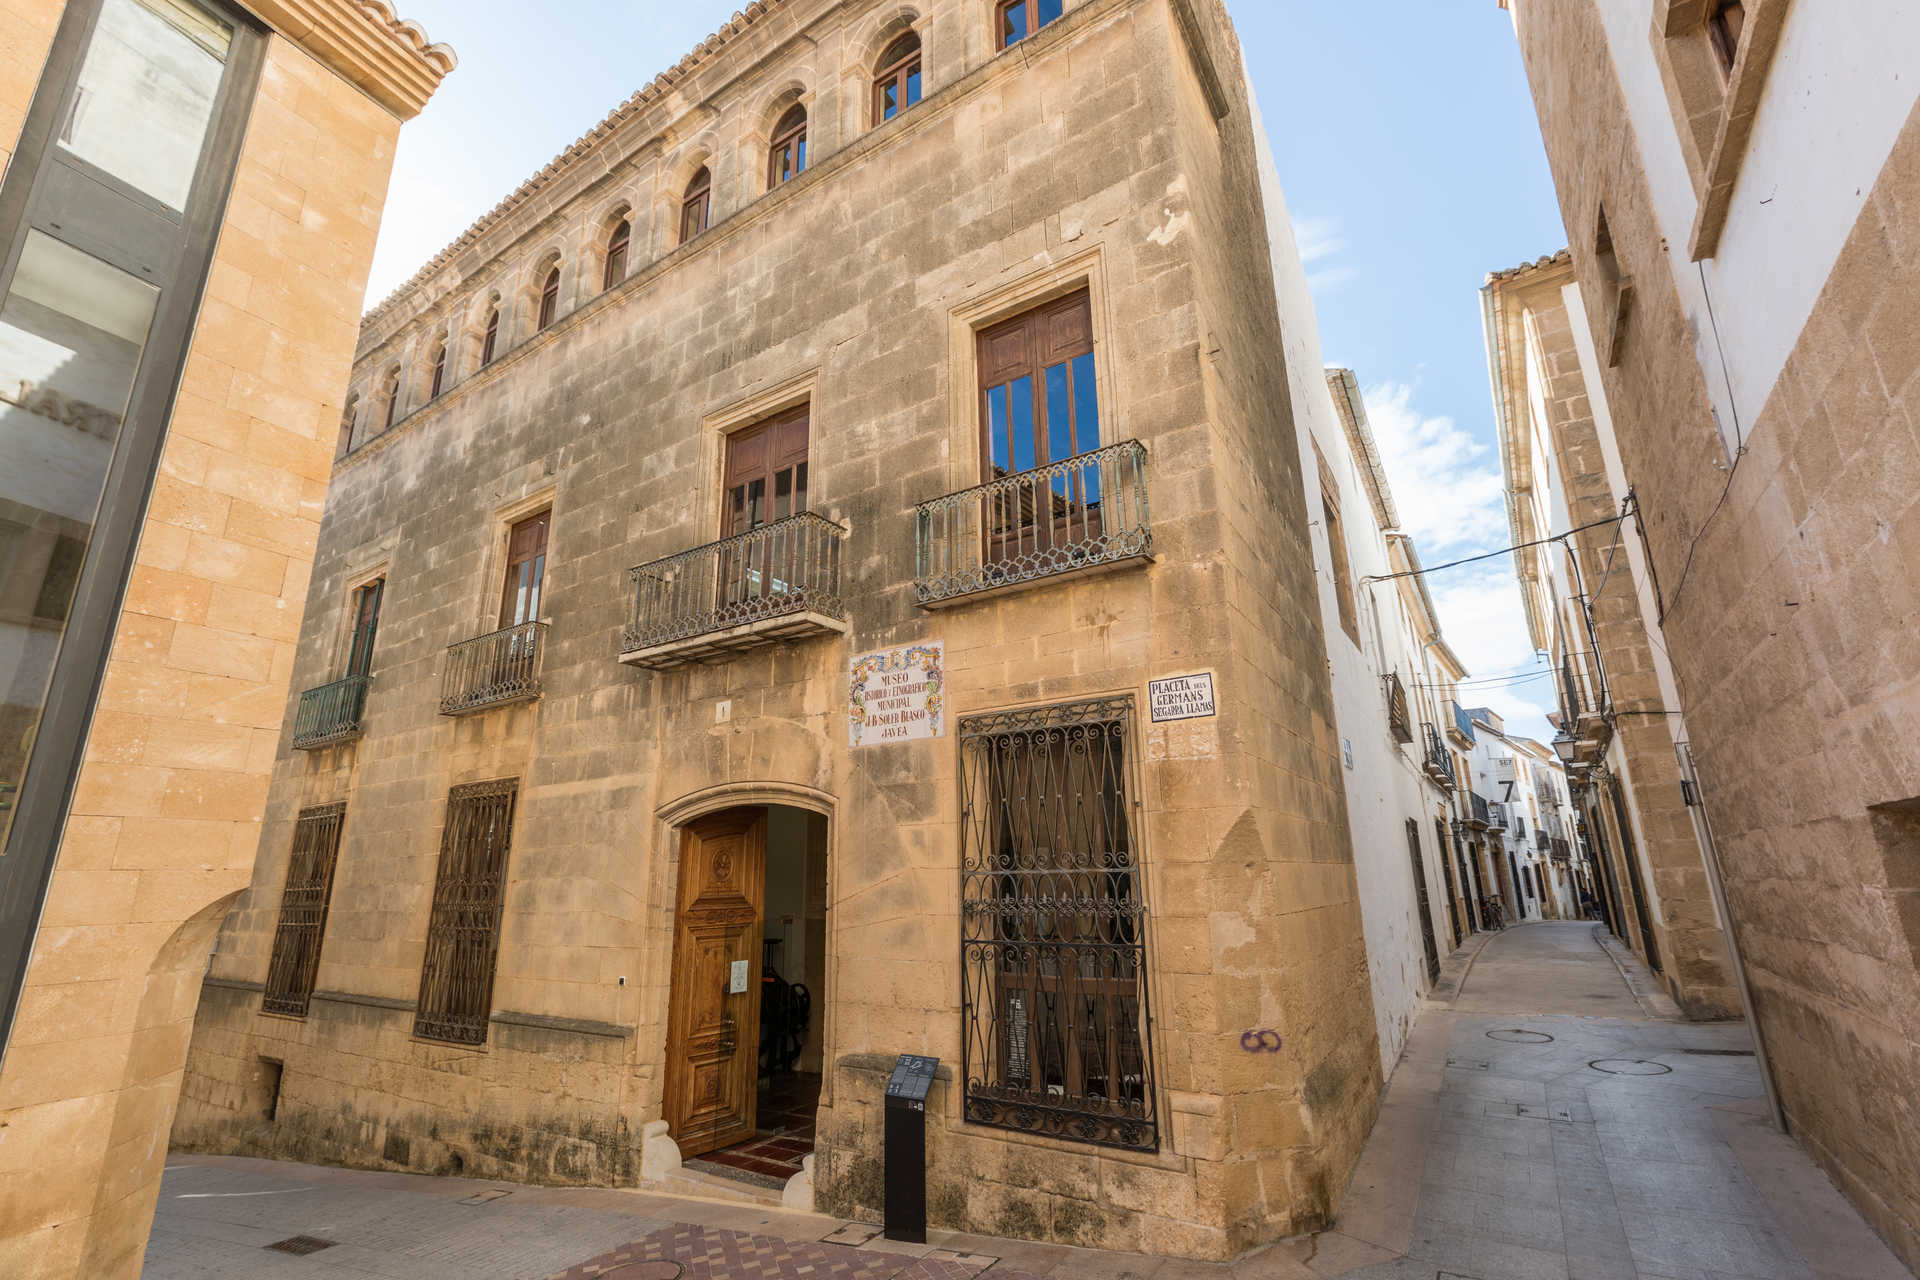 Museu Arqueològic i Etnogràfic Soler Blasco